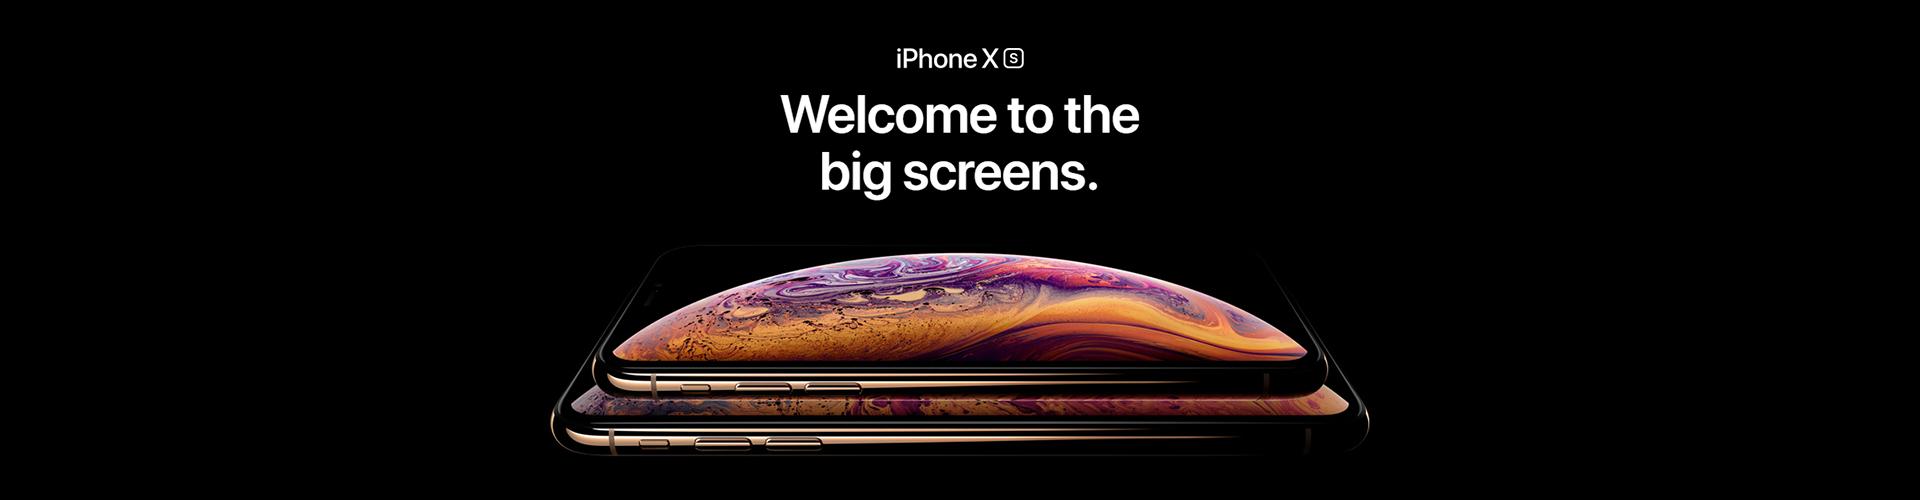 iPhone XS img